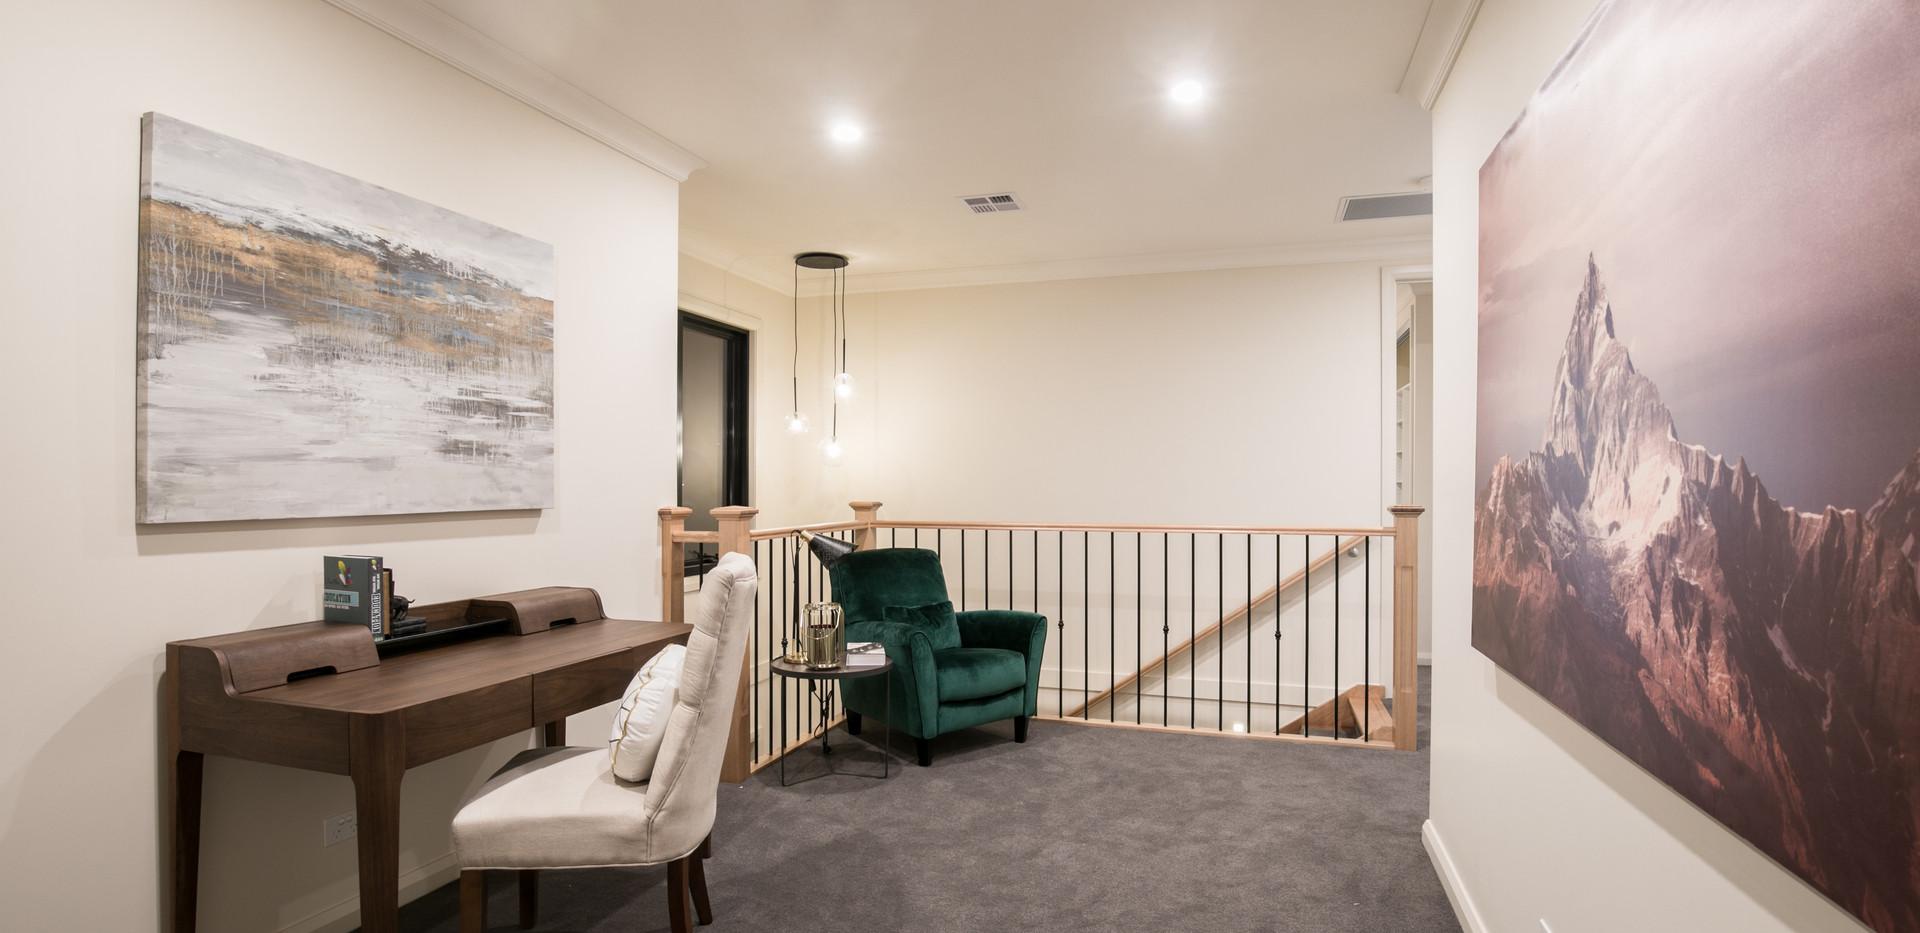 Finlayson Upper Floor